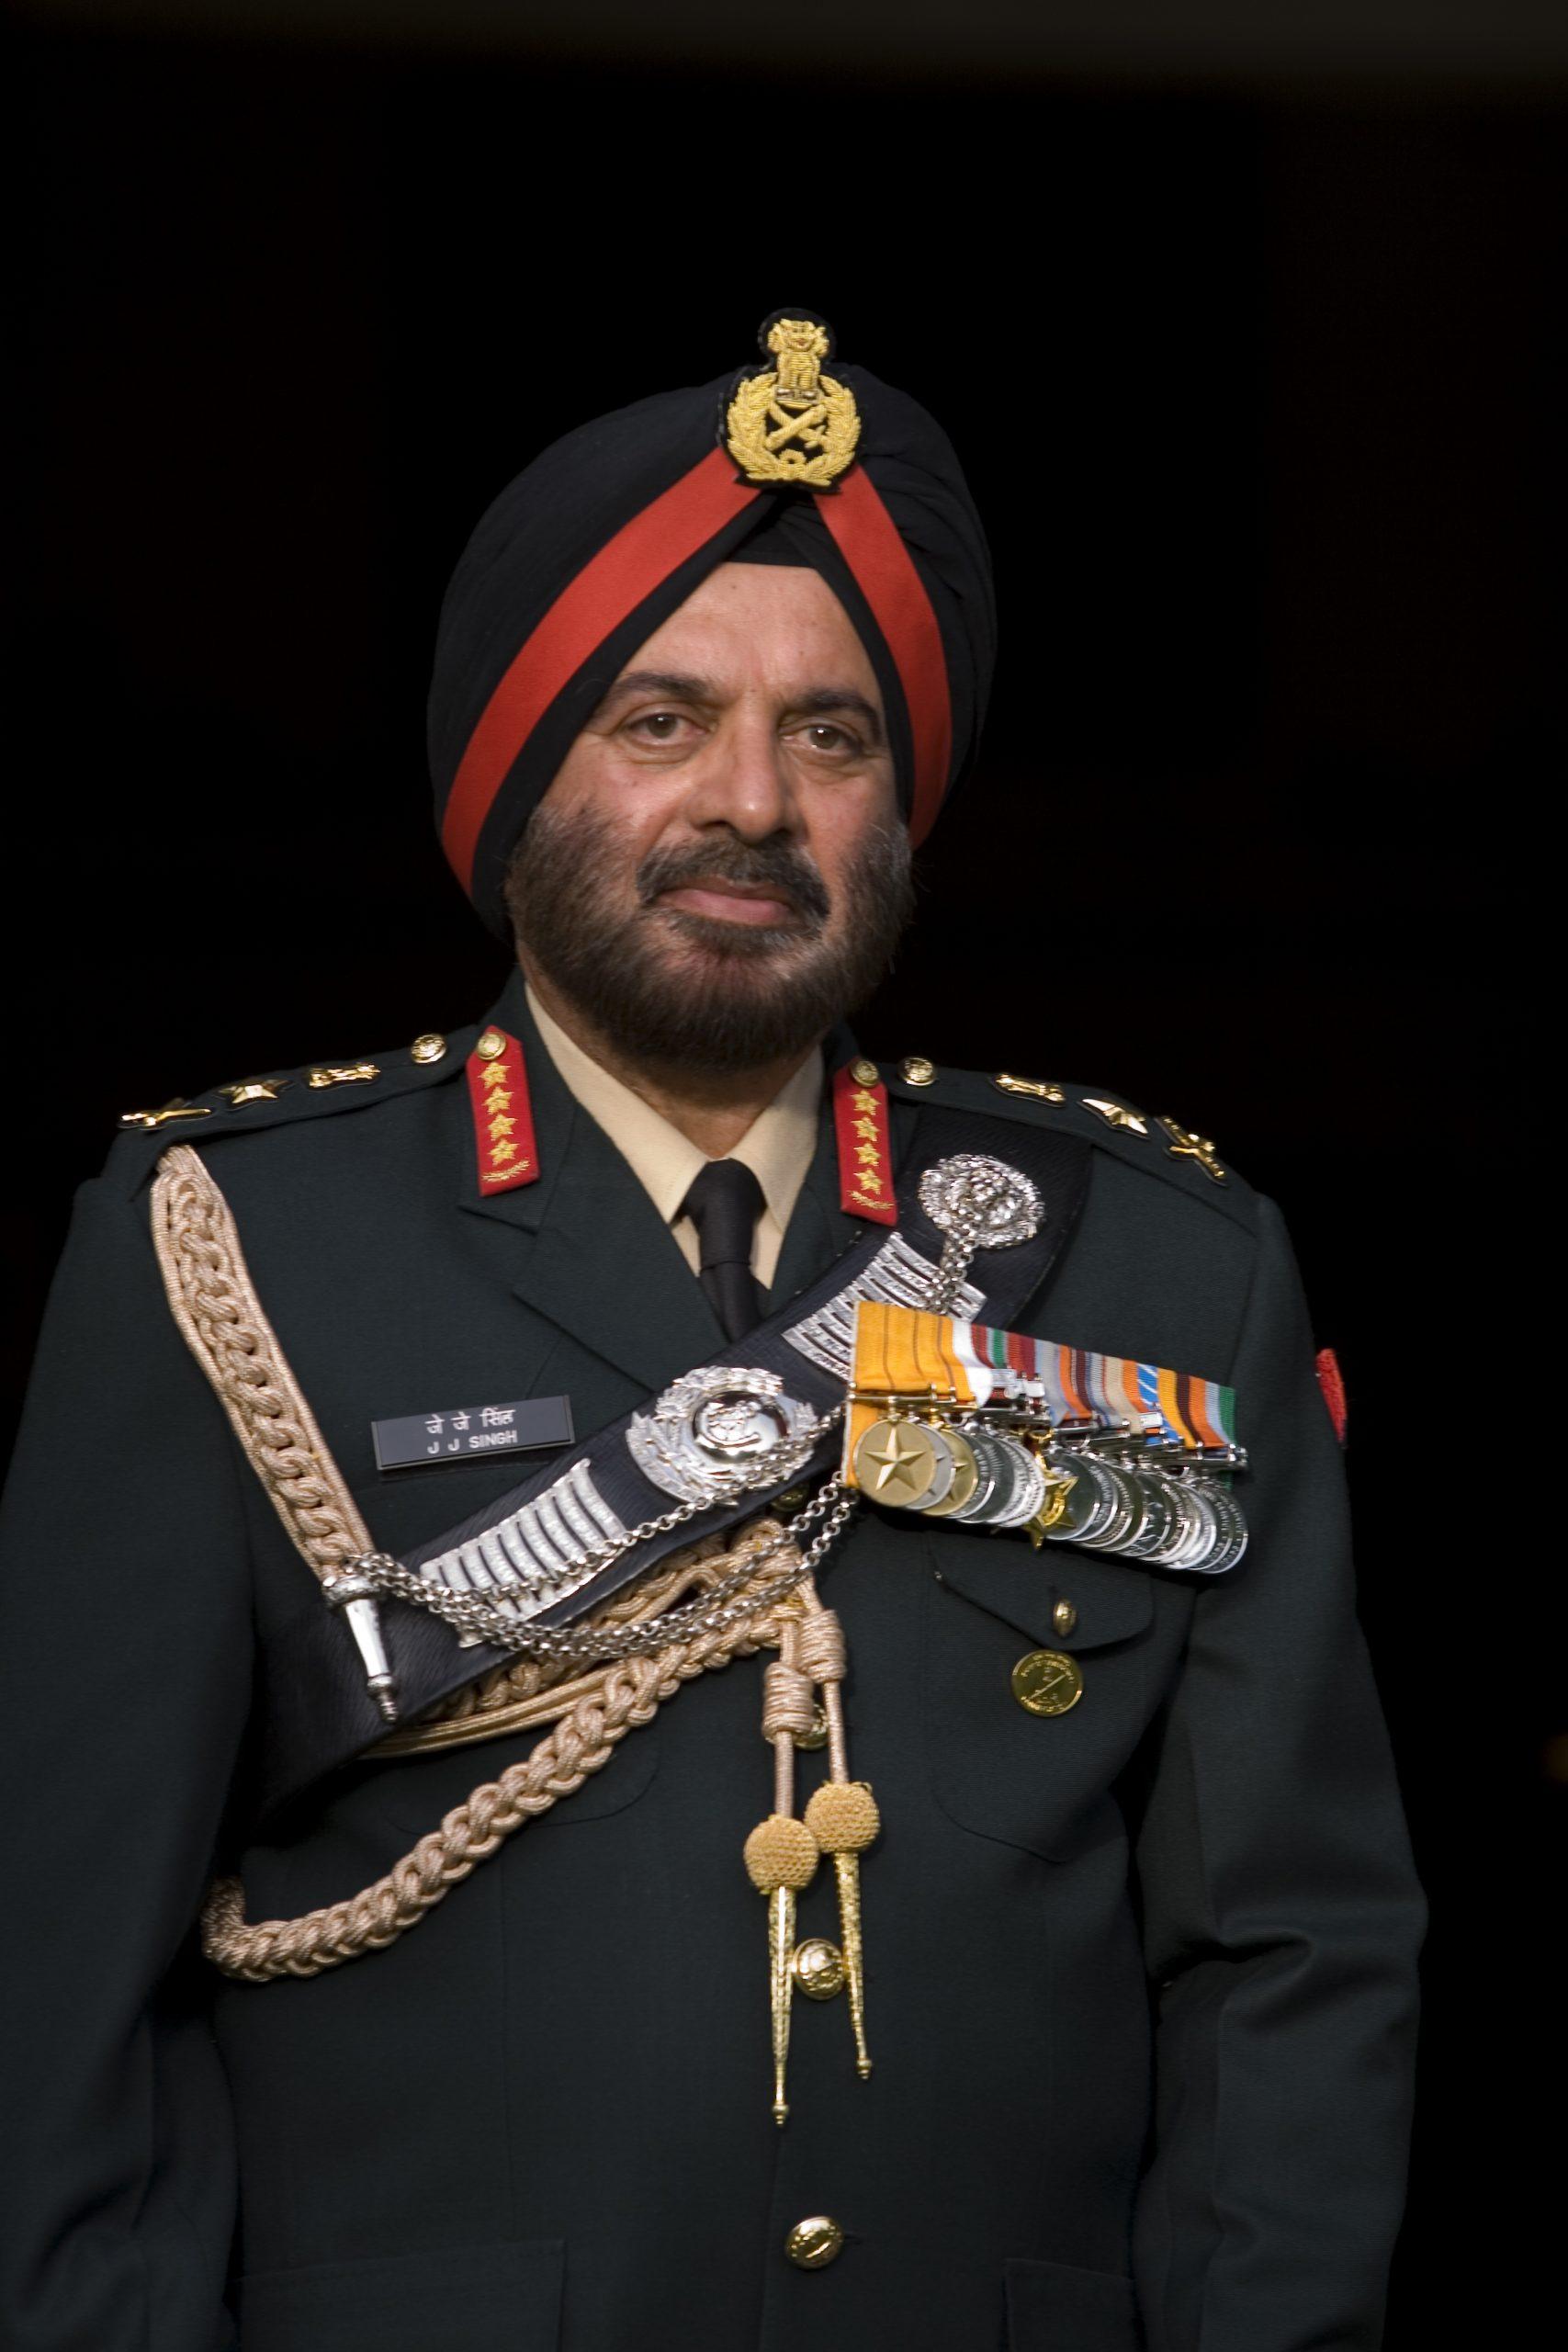 General JJ SINGH, PVSM, AVSM, VSM (RETD) Former Governor of Arunachal Pradesh and COAS Indian Army